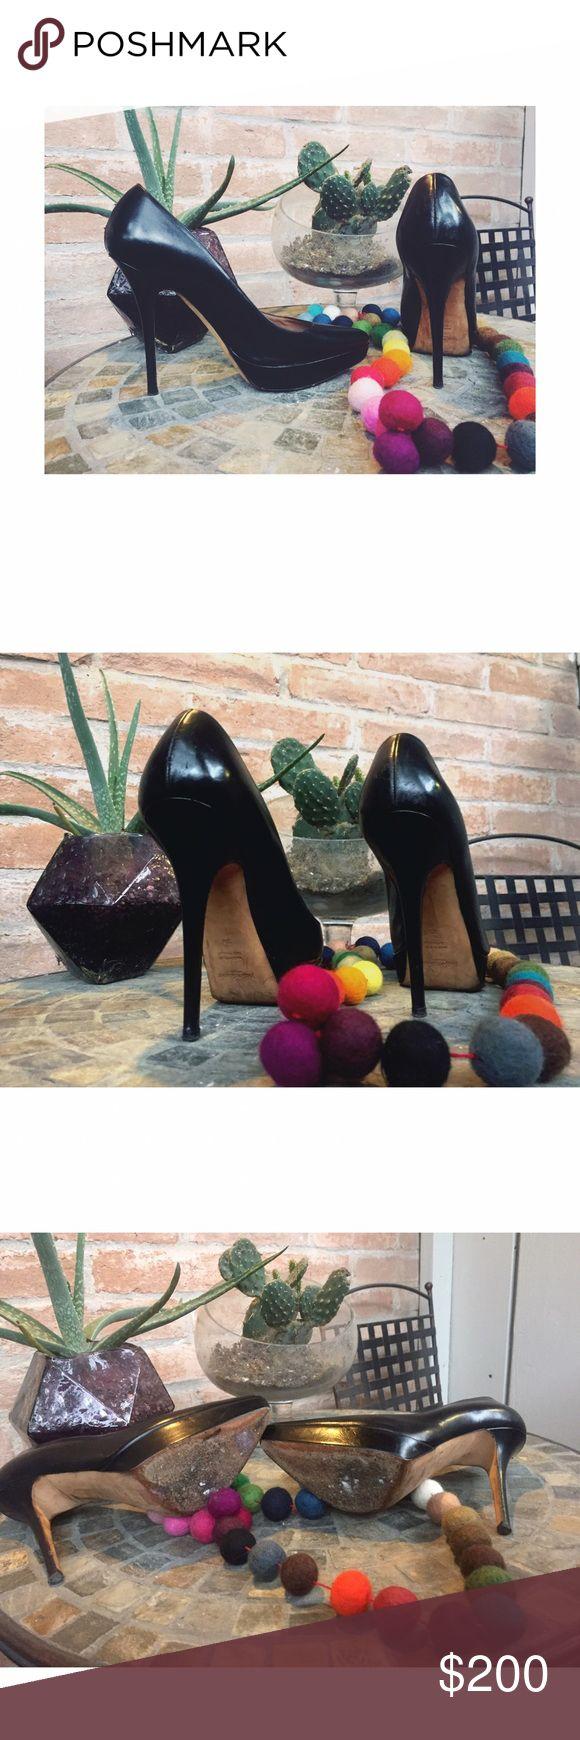 YSL Noir Pumps SALE ENDS TOMORROW AT 12- SALE-----YSL Black Pumps, Noir, 38 - Fits a 7.5-8 🖤 Please zoom in, ask questions if needed 🖤 Yves Saint Laurent Shoes Heels